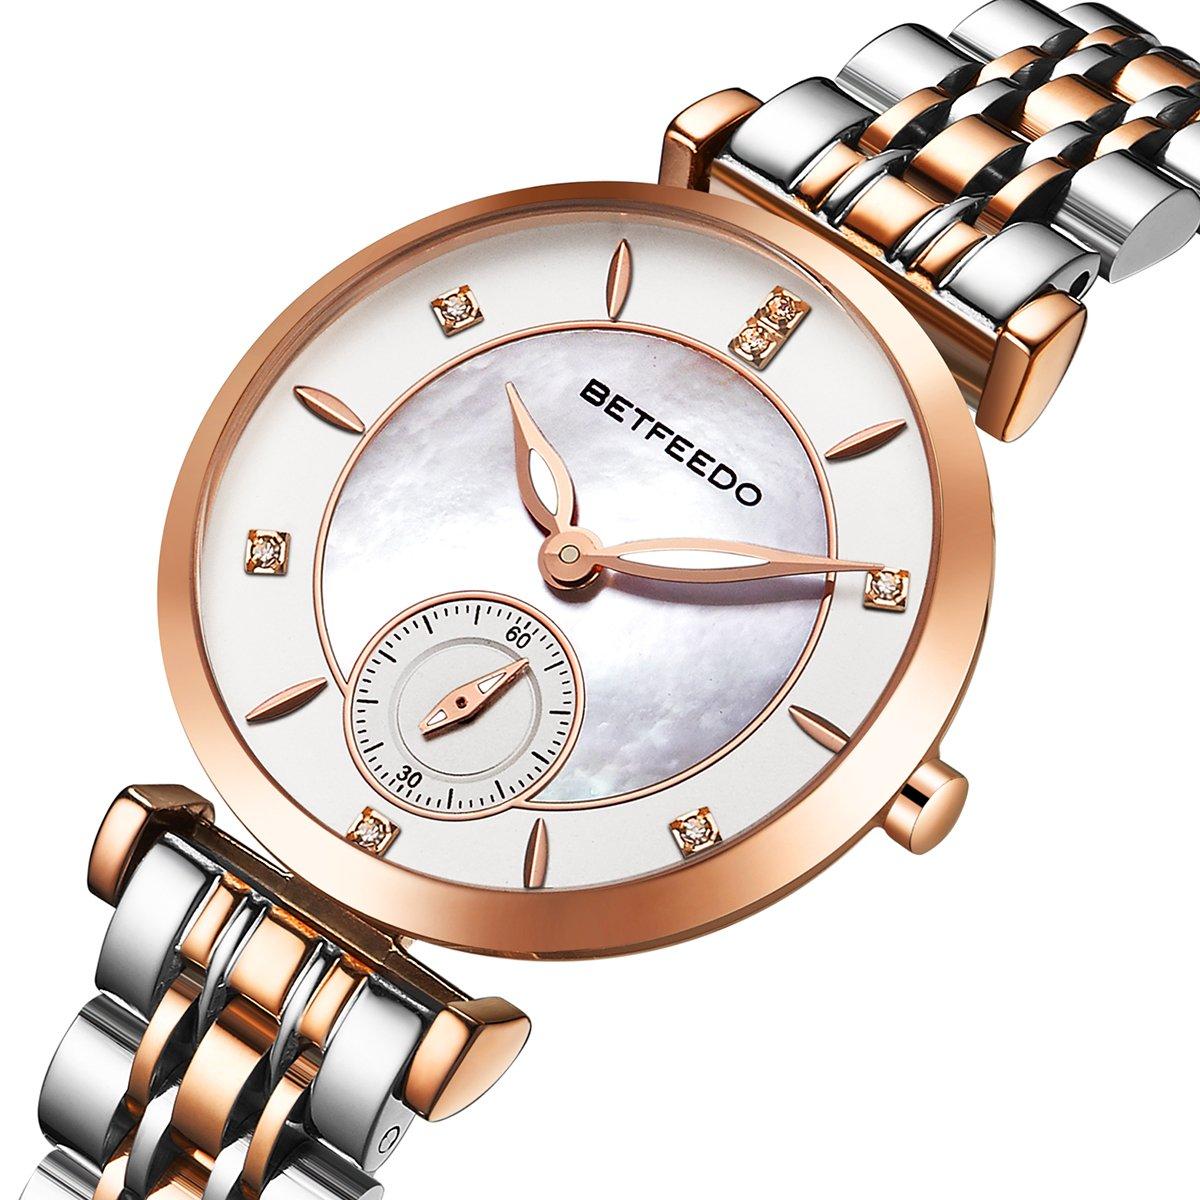 Wrist Watch for Women, Ladies Watch,Rose Gold Watch for Girls,BETFEEDO Waterproof Quartz Dress Watches (Rose Gold/Silver)